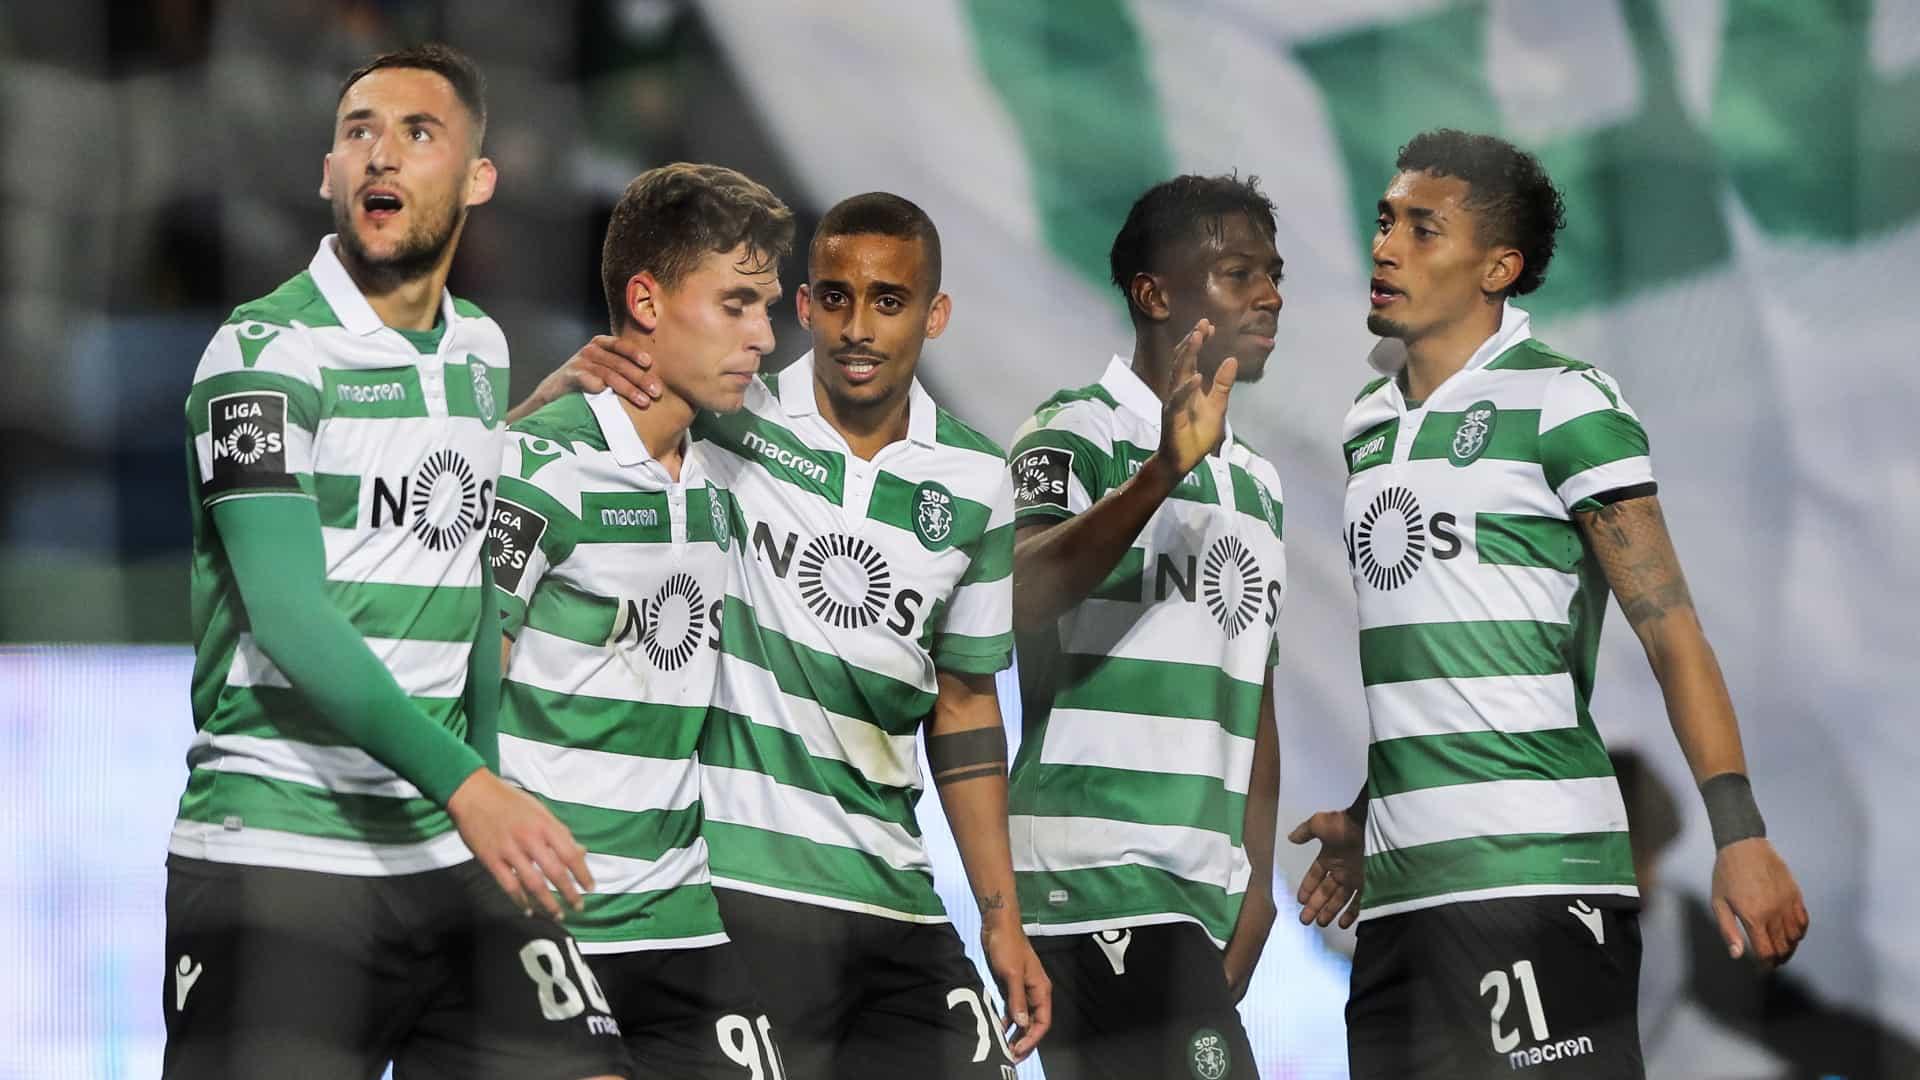 Prognóstico Sporting x Rosenborg